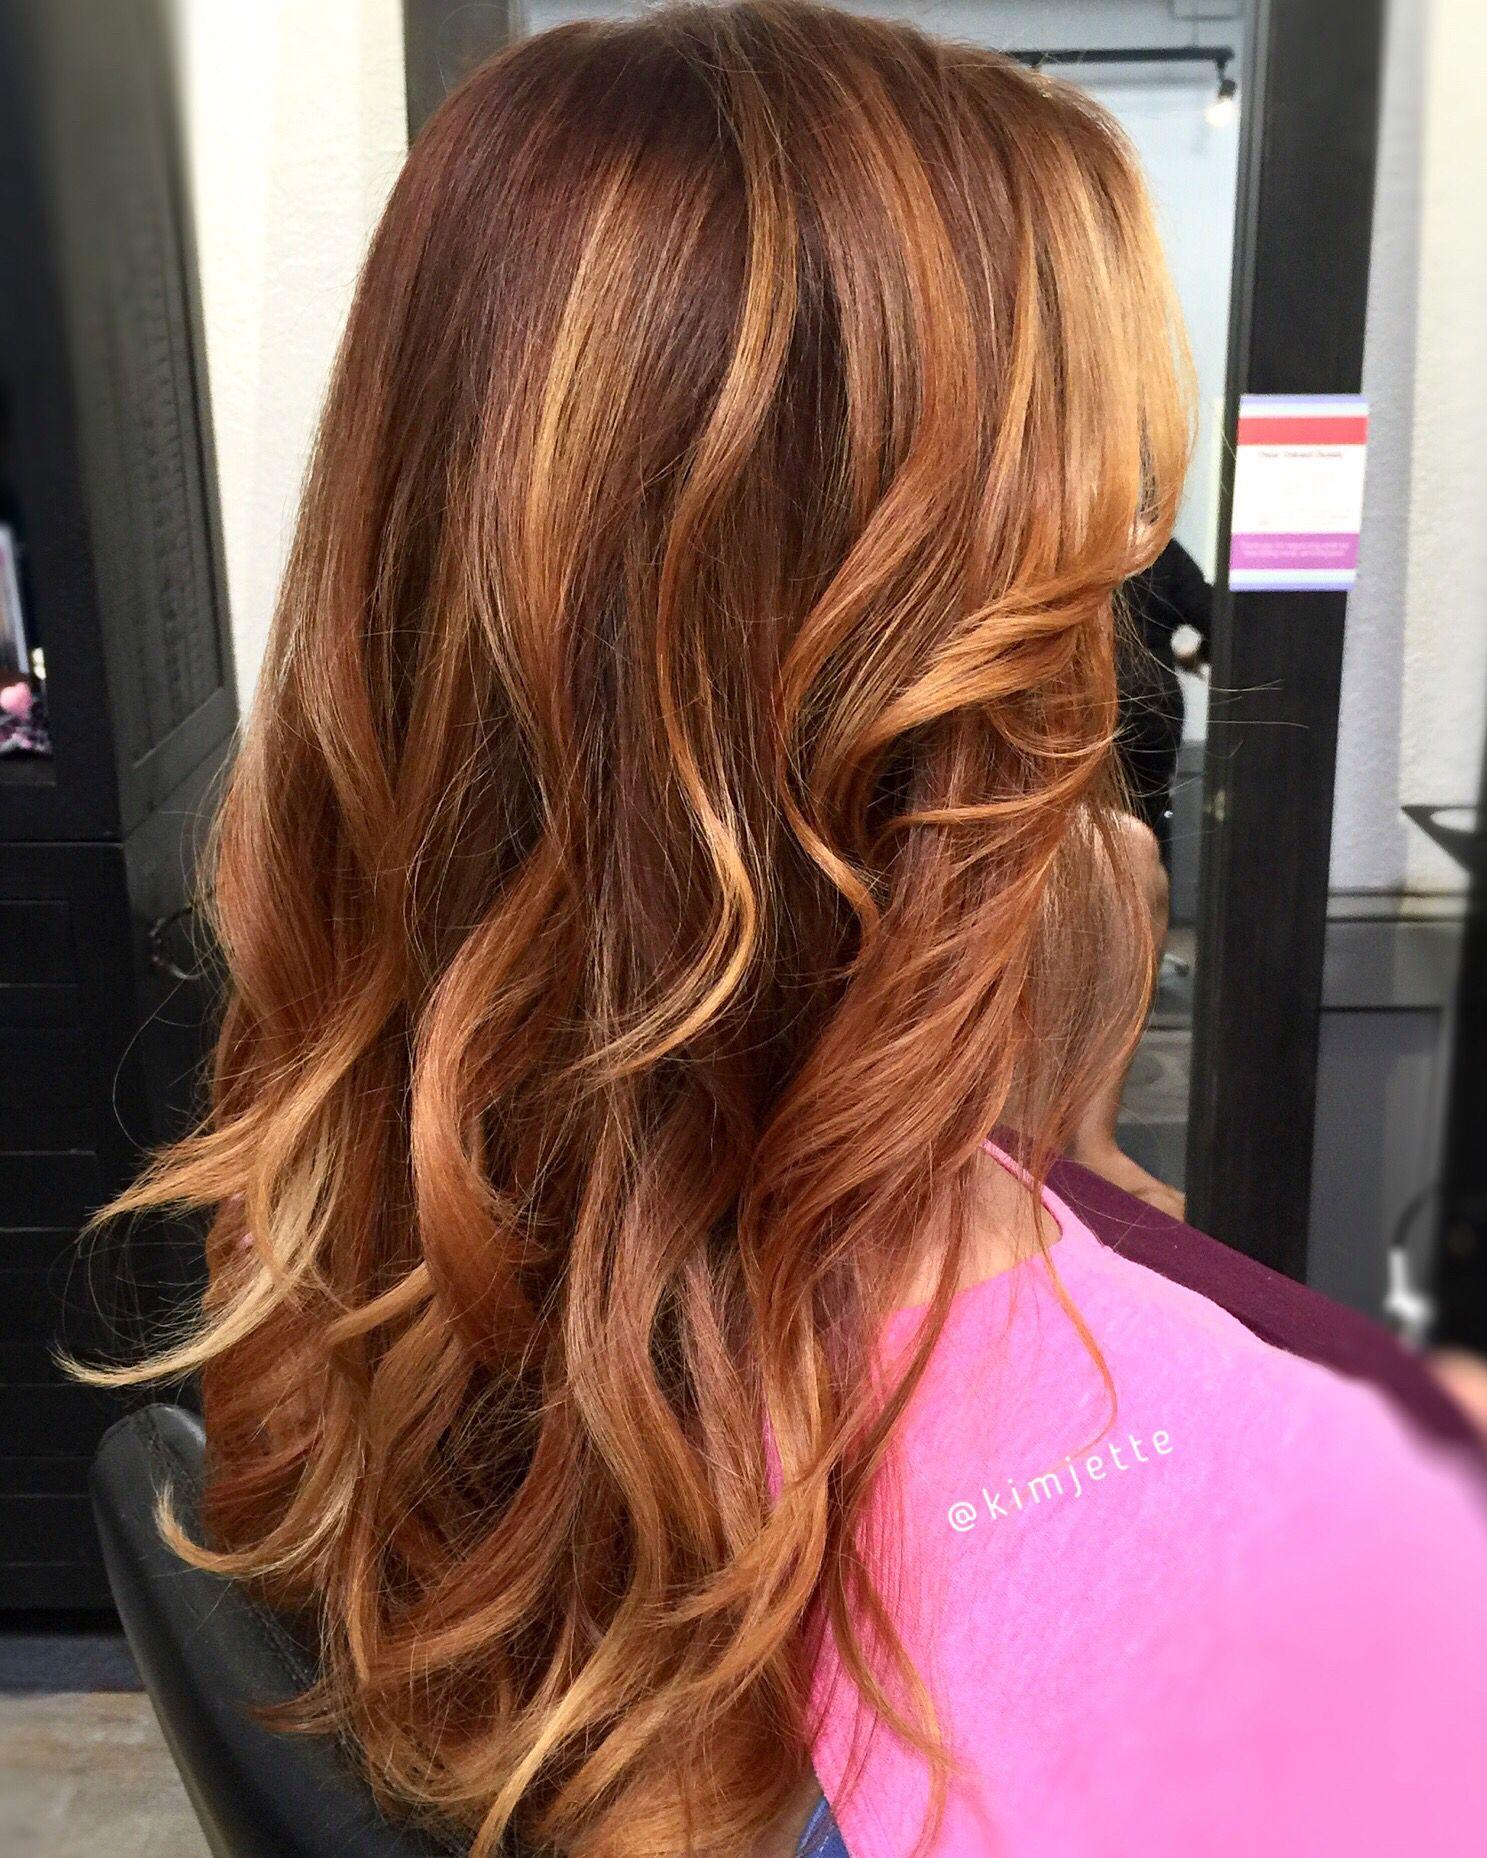 Strawberry blonde highlights | I'm a GIRL | Balayage hair ...